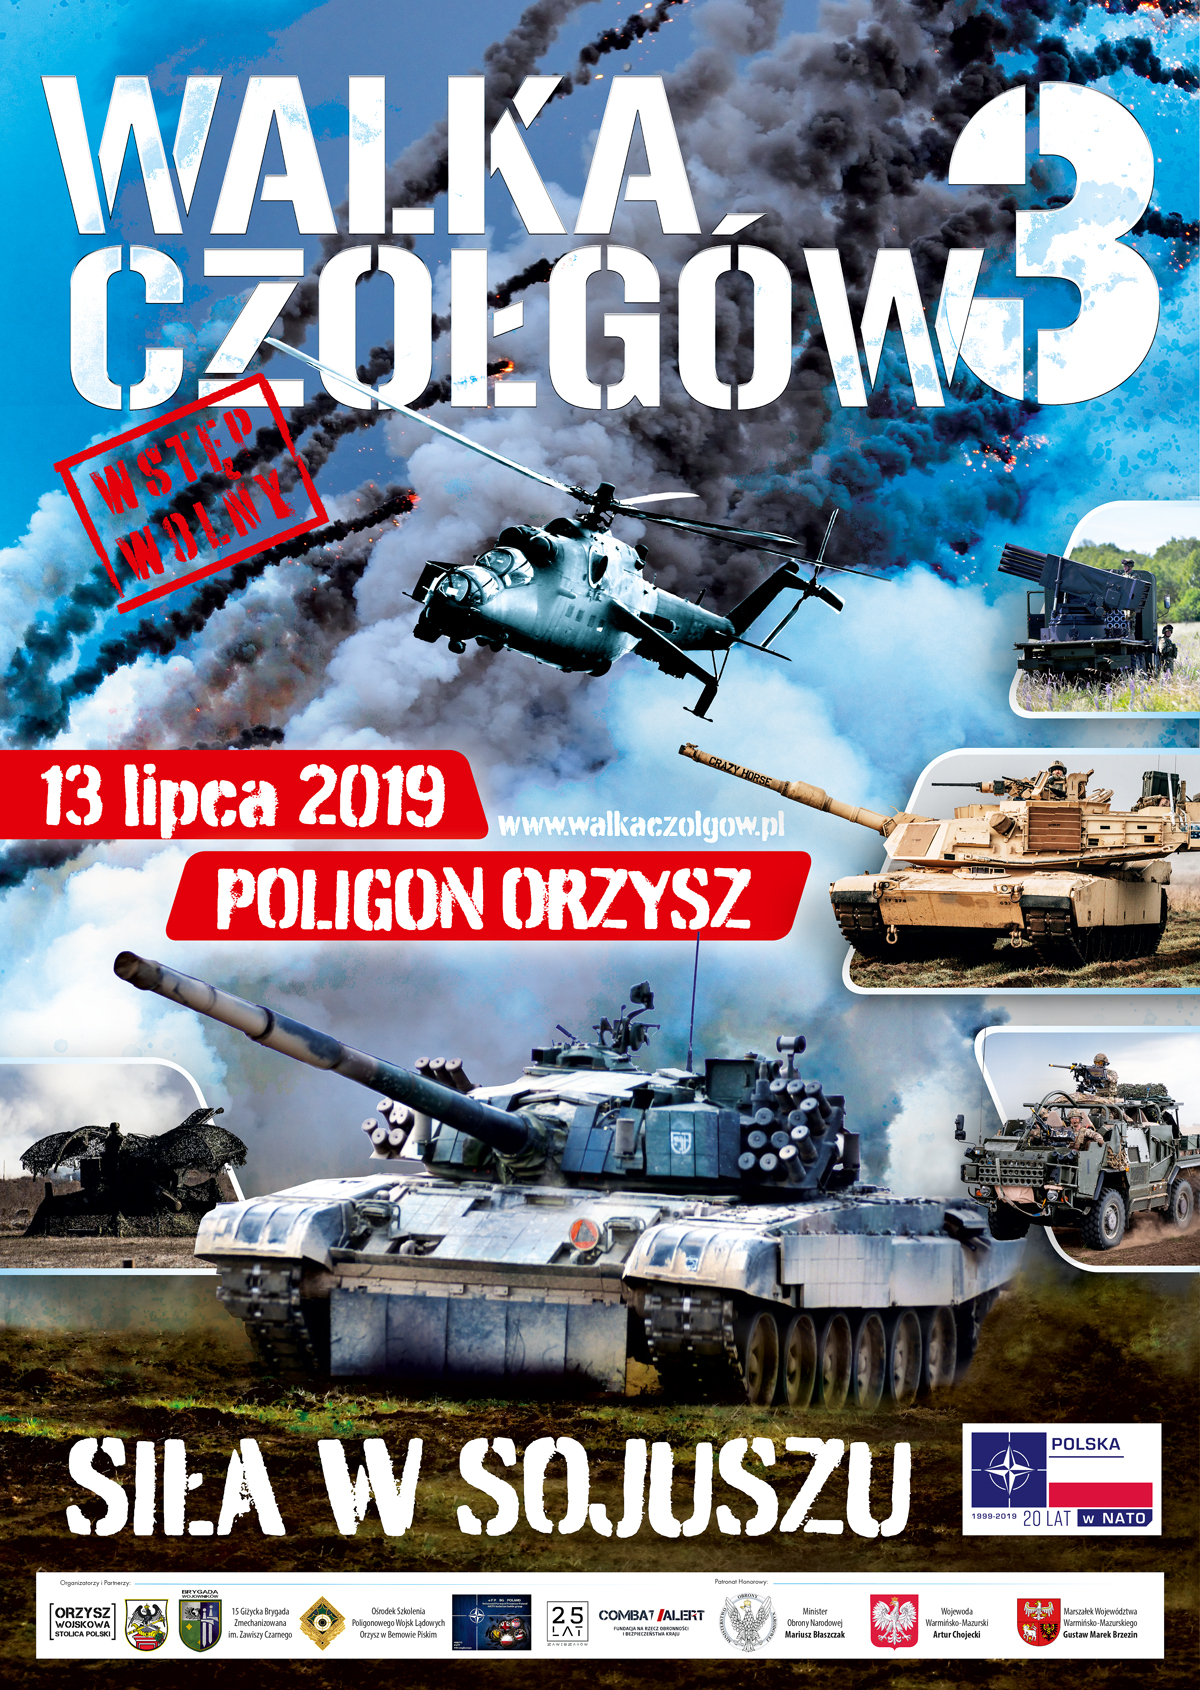 http://m.wm.pl/2019/07/orig/plakat-a2-prev-560936.jpg